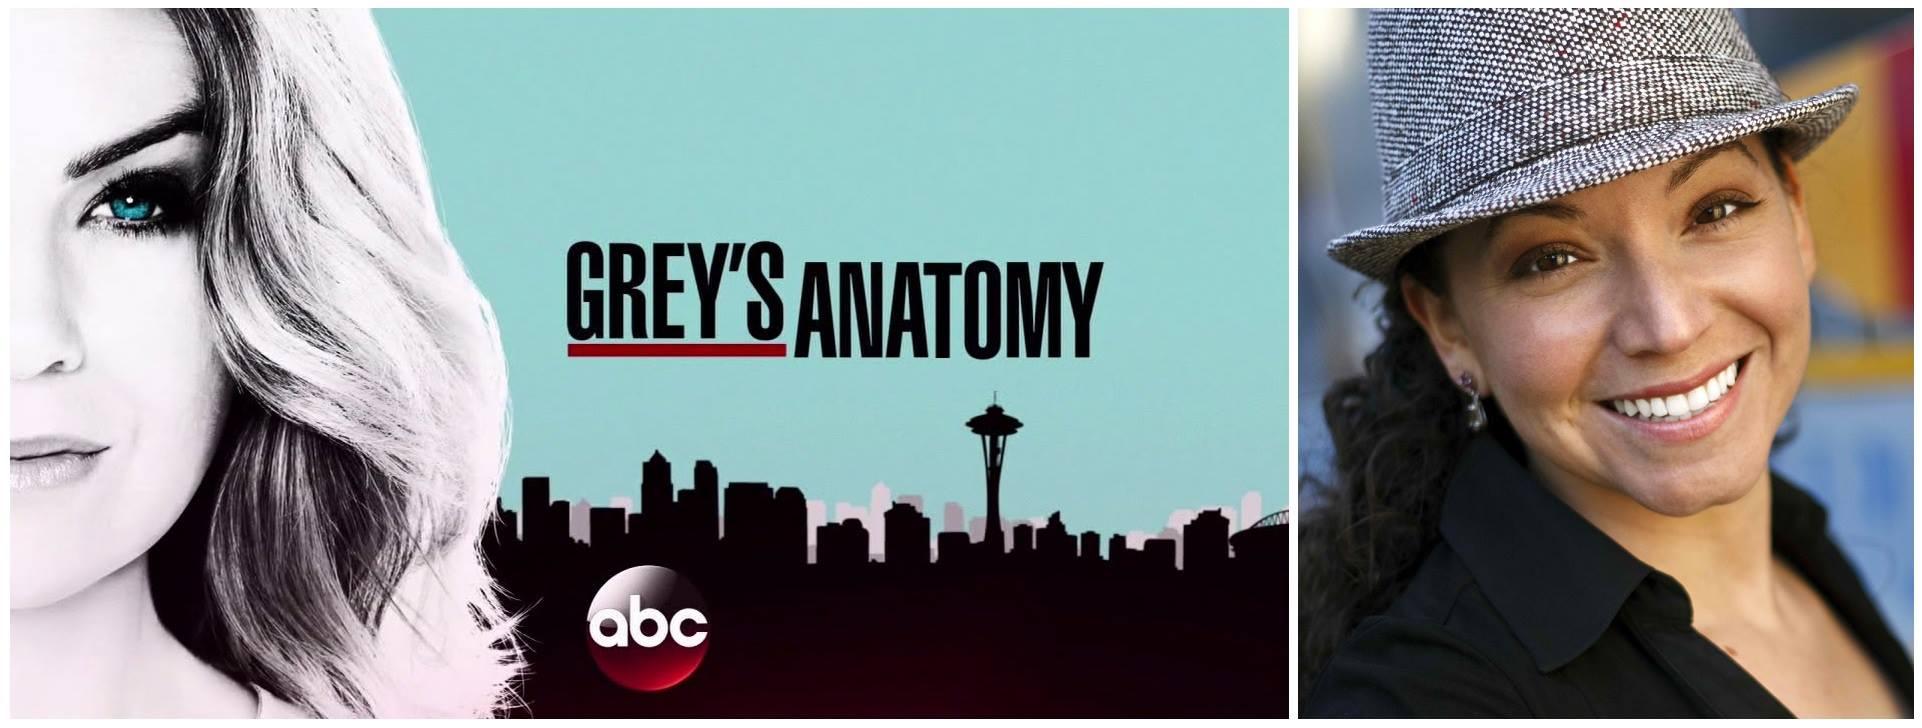 Rebecca_Murga_-_Greys_Anatomy.jpg